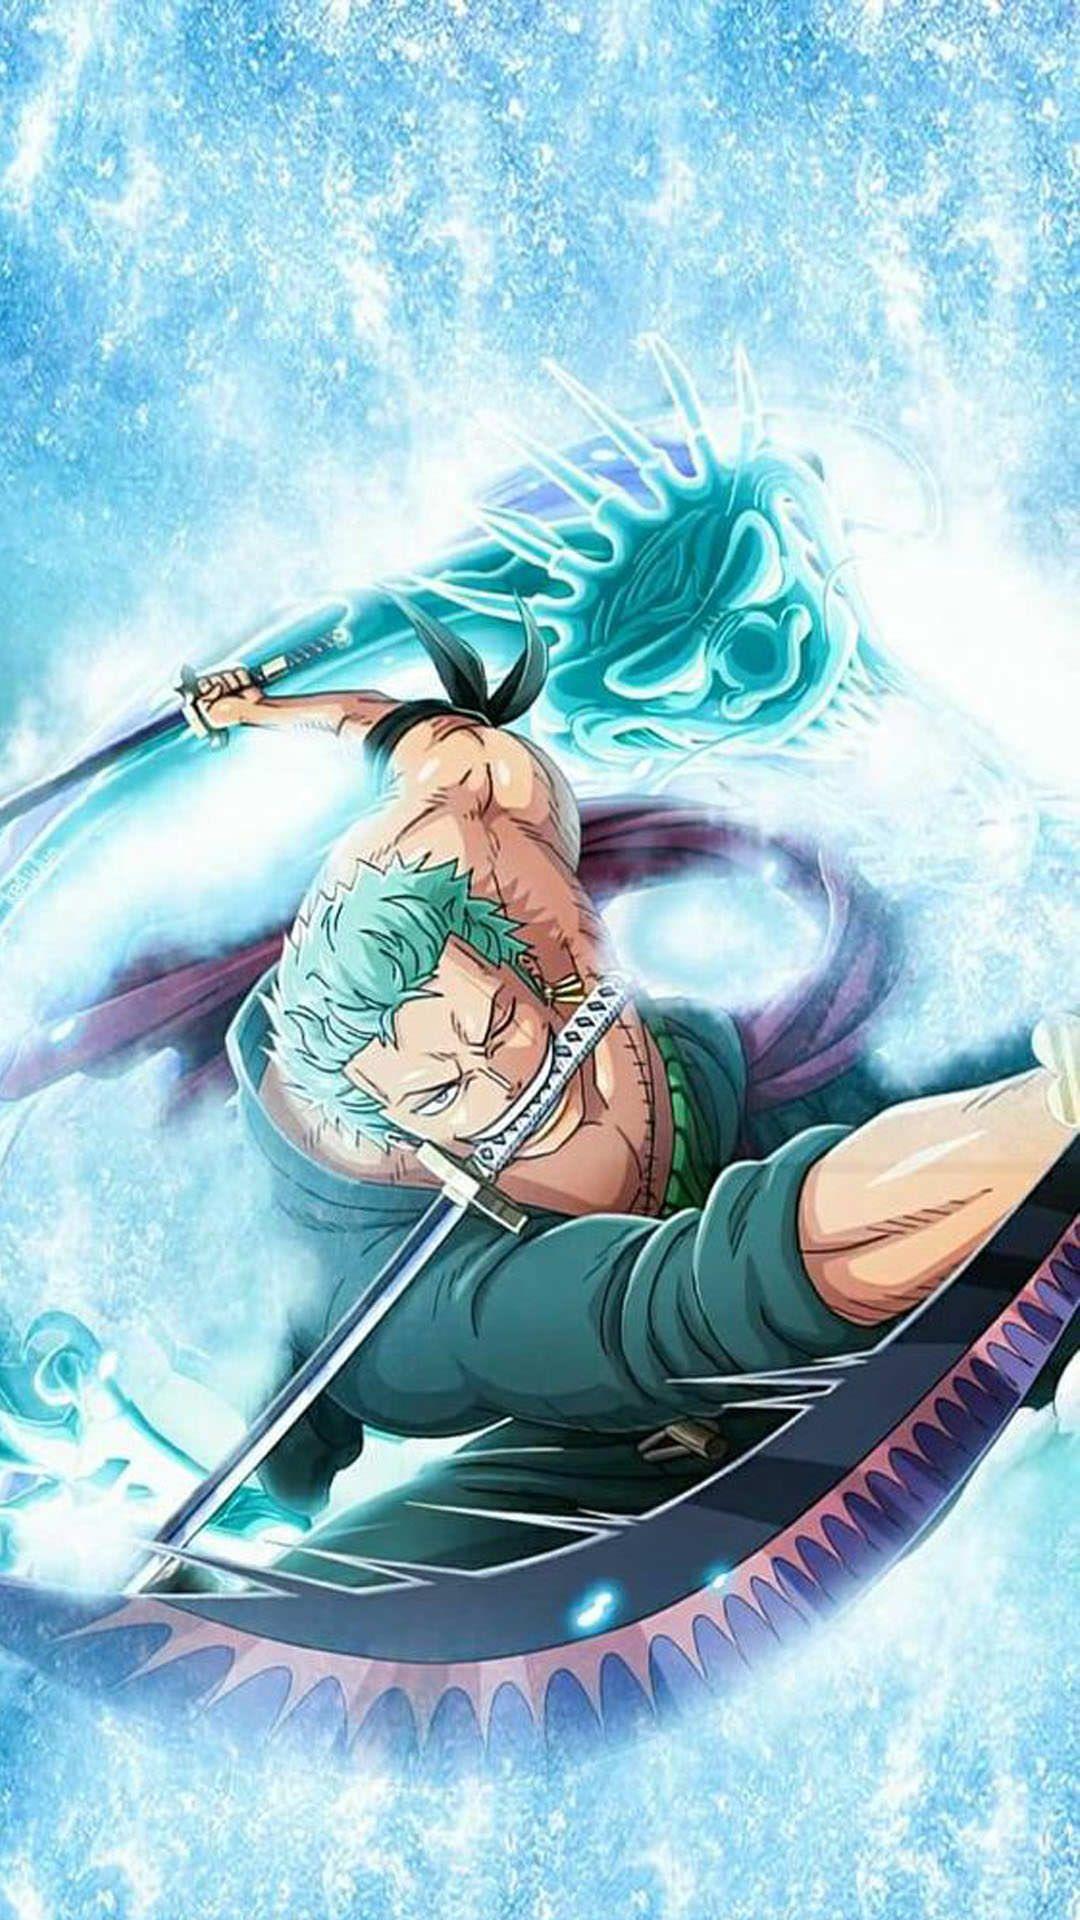 Roronoa Zoro Wallpaper 4 Personagens De Anime One Piece Anime One Piece Personagens